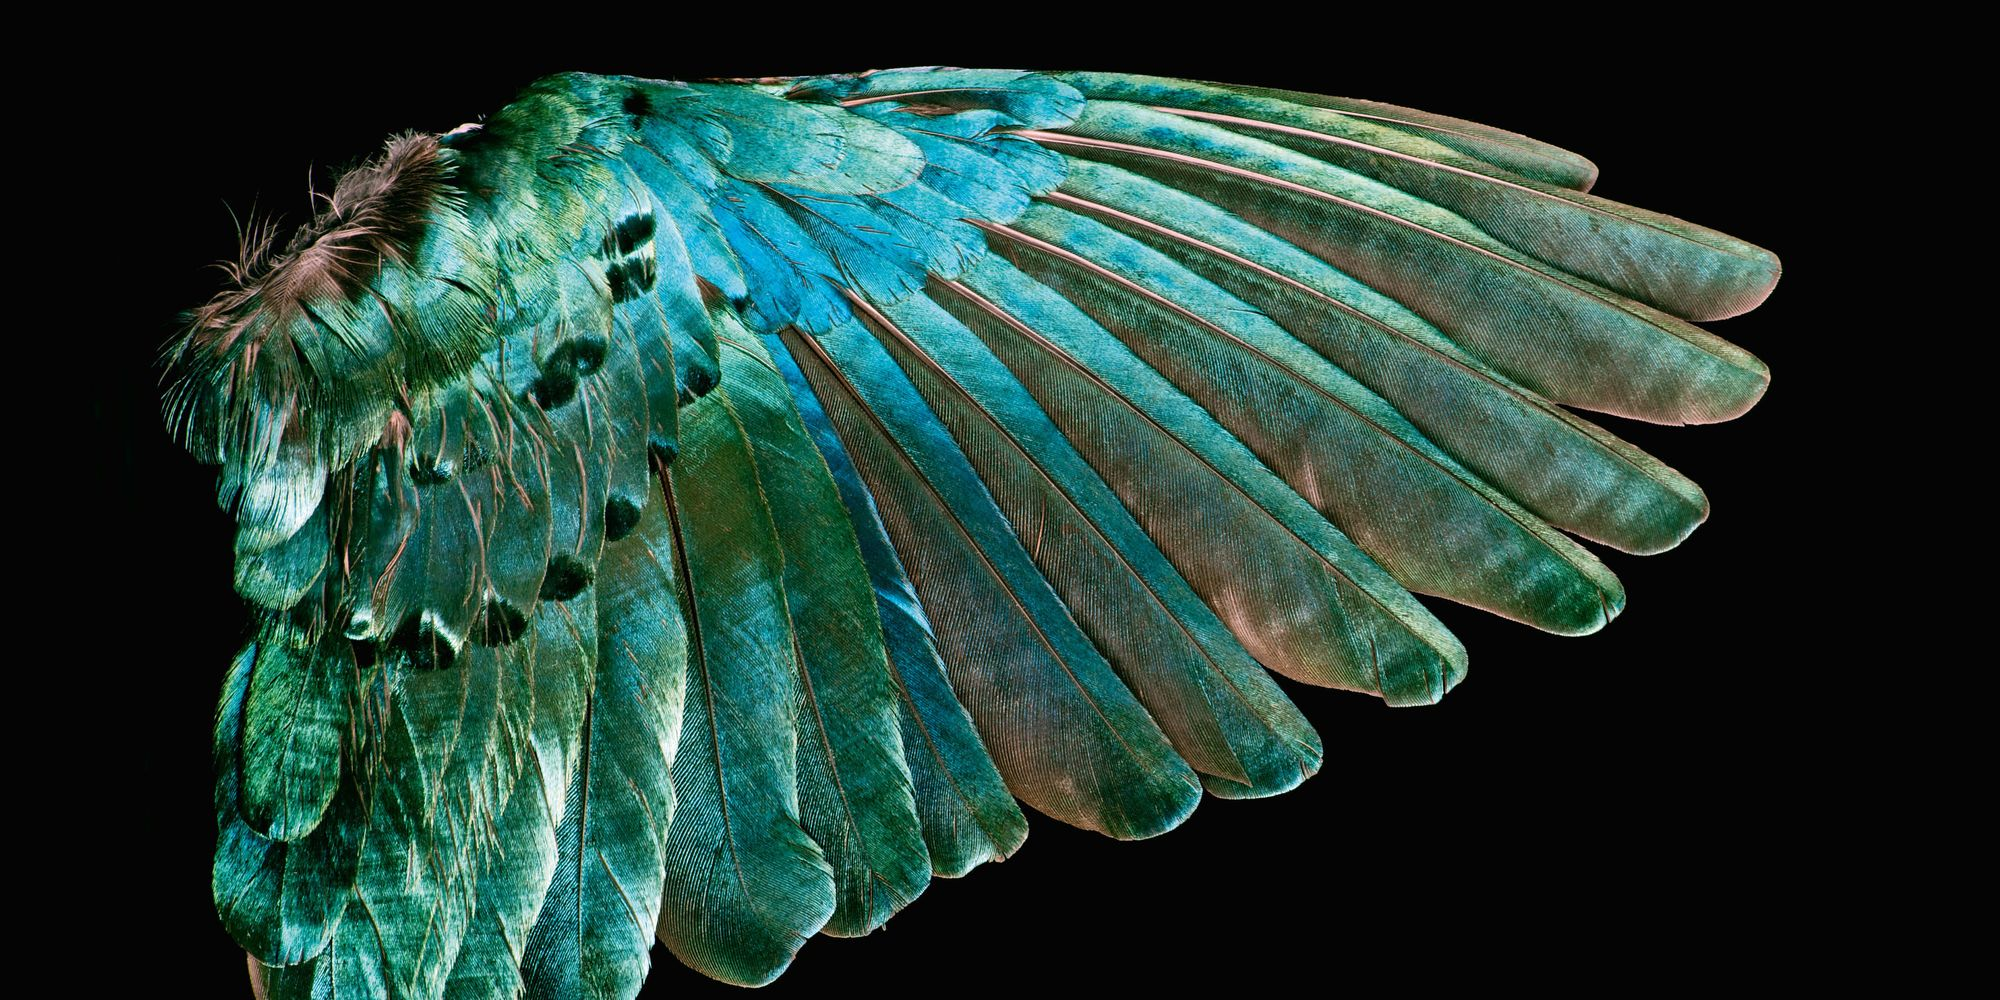 Hypnotic Book Surveys The Natural Beauty Of Wild Bird ... - photo#34